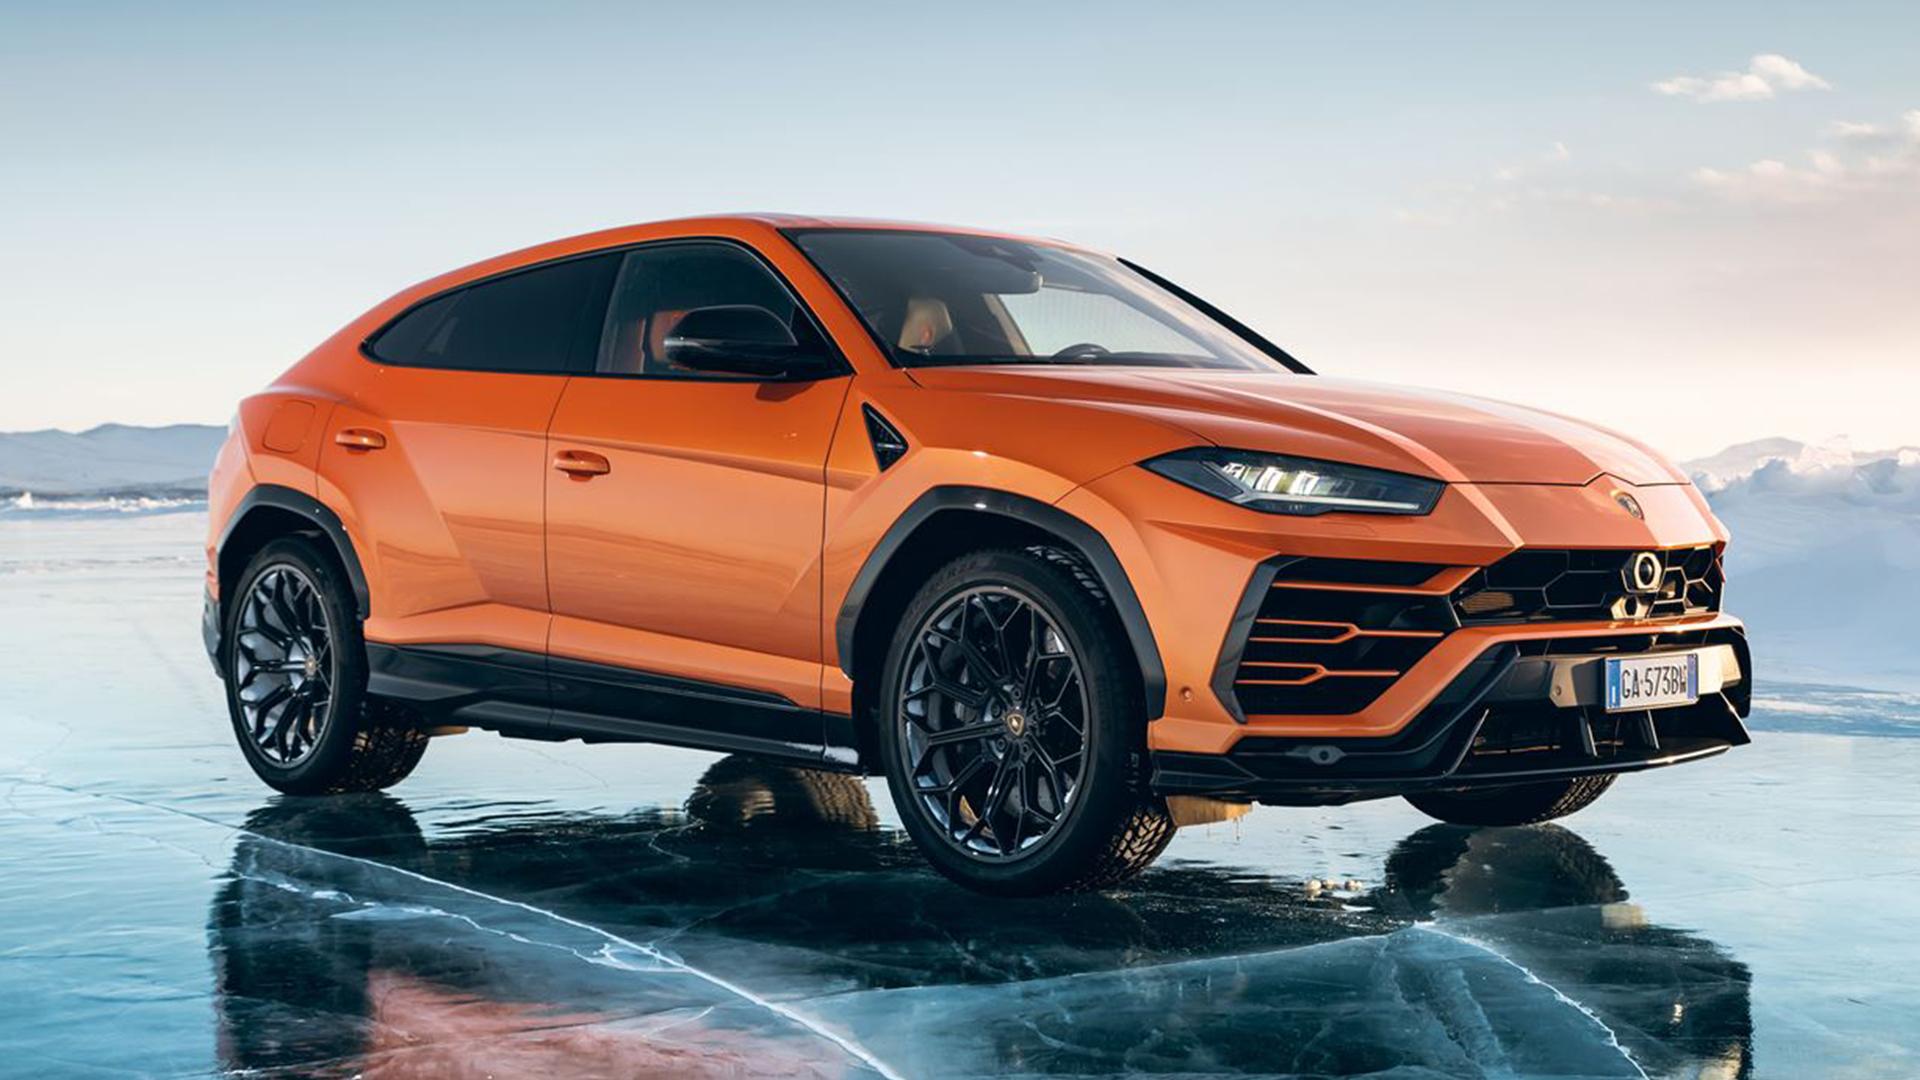 Lamborghini Urus vista lateral